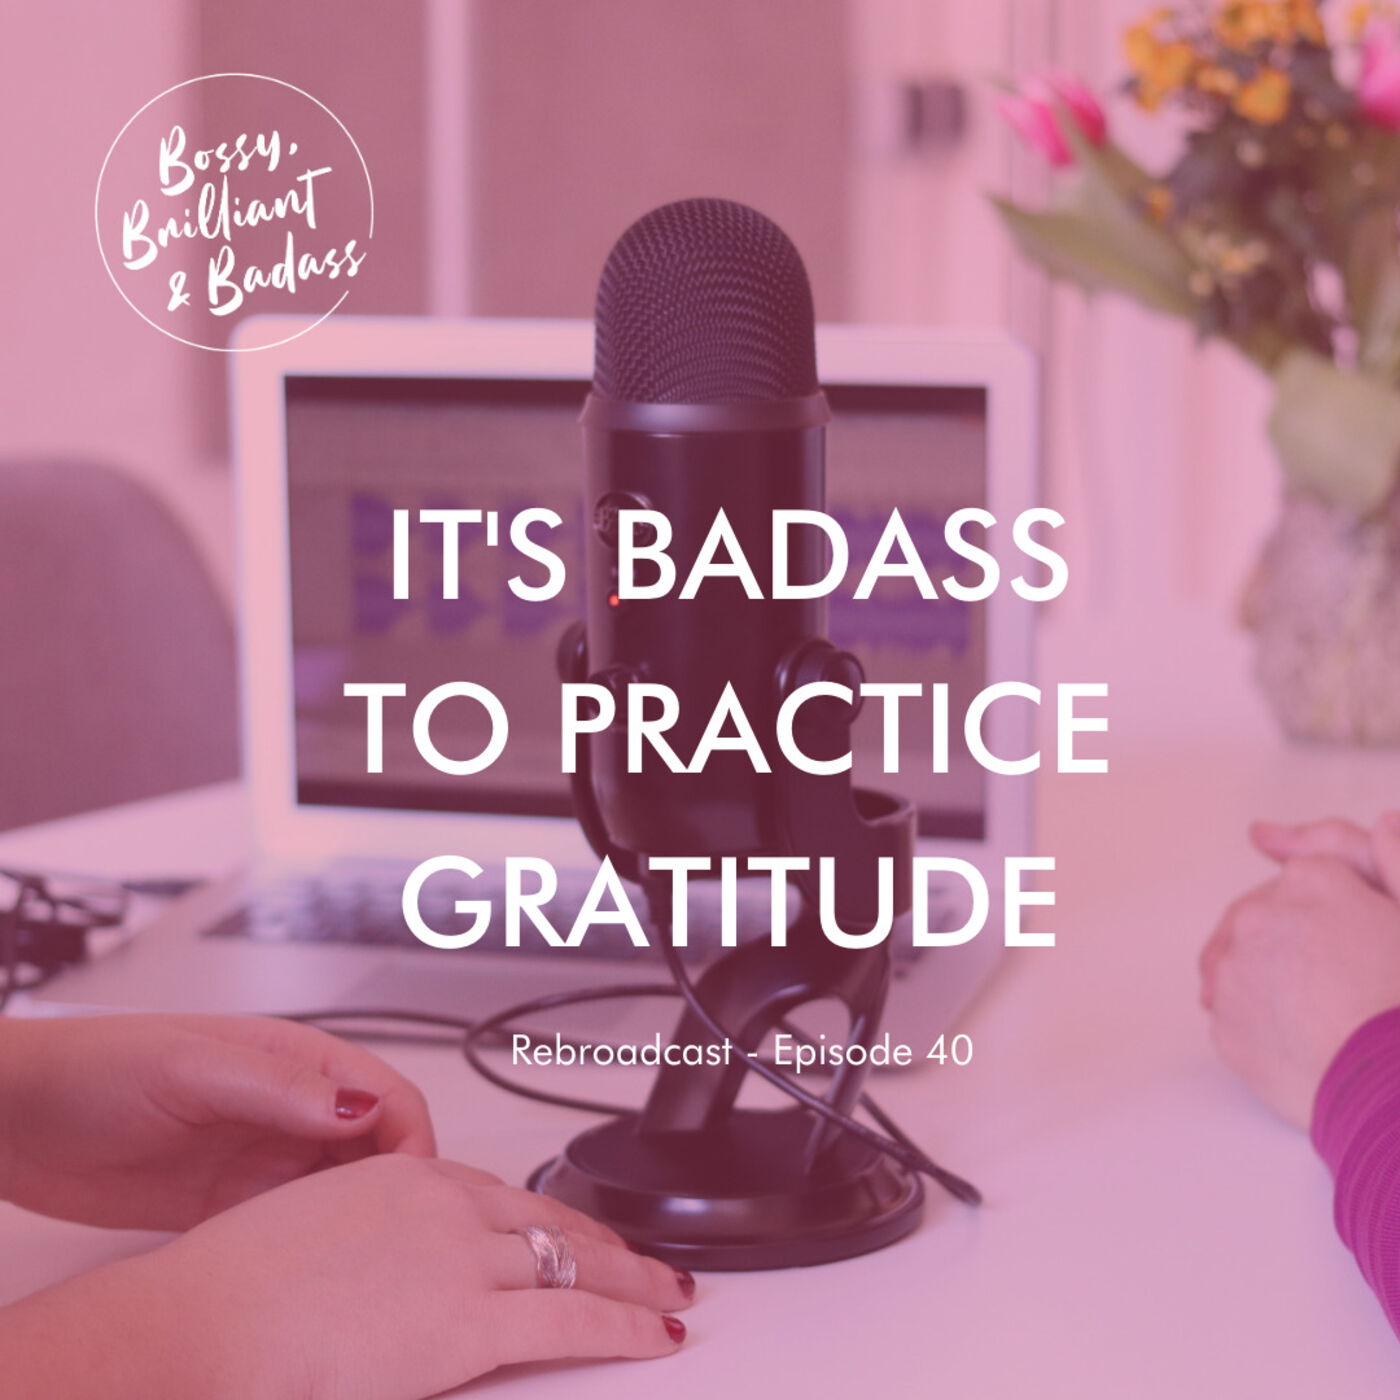 REBROADCAST - It's Badass to Practice Gratitude!